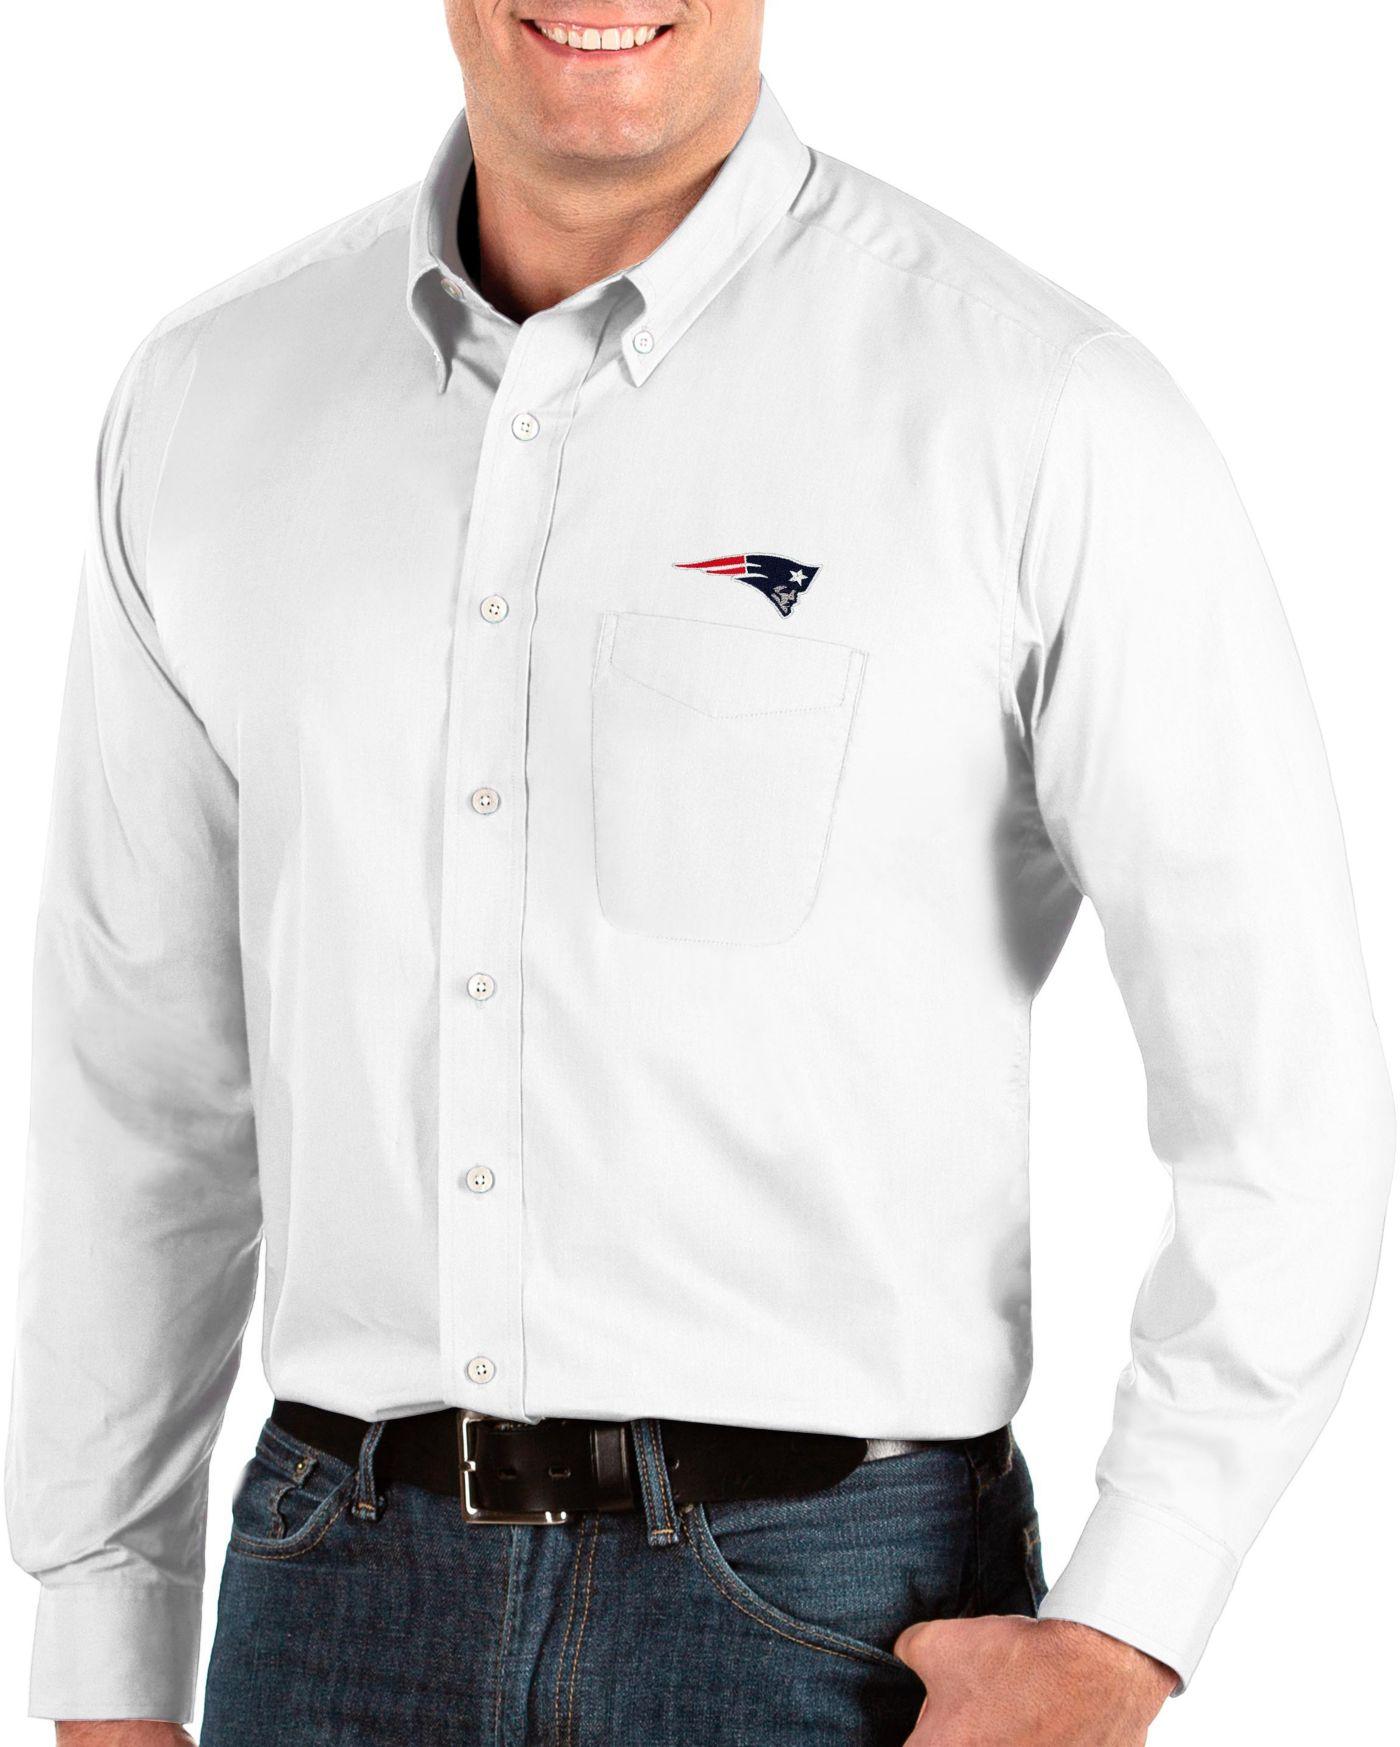 Antigua Men's New England Patriots Dynasty Button Down White Dress Shirt